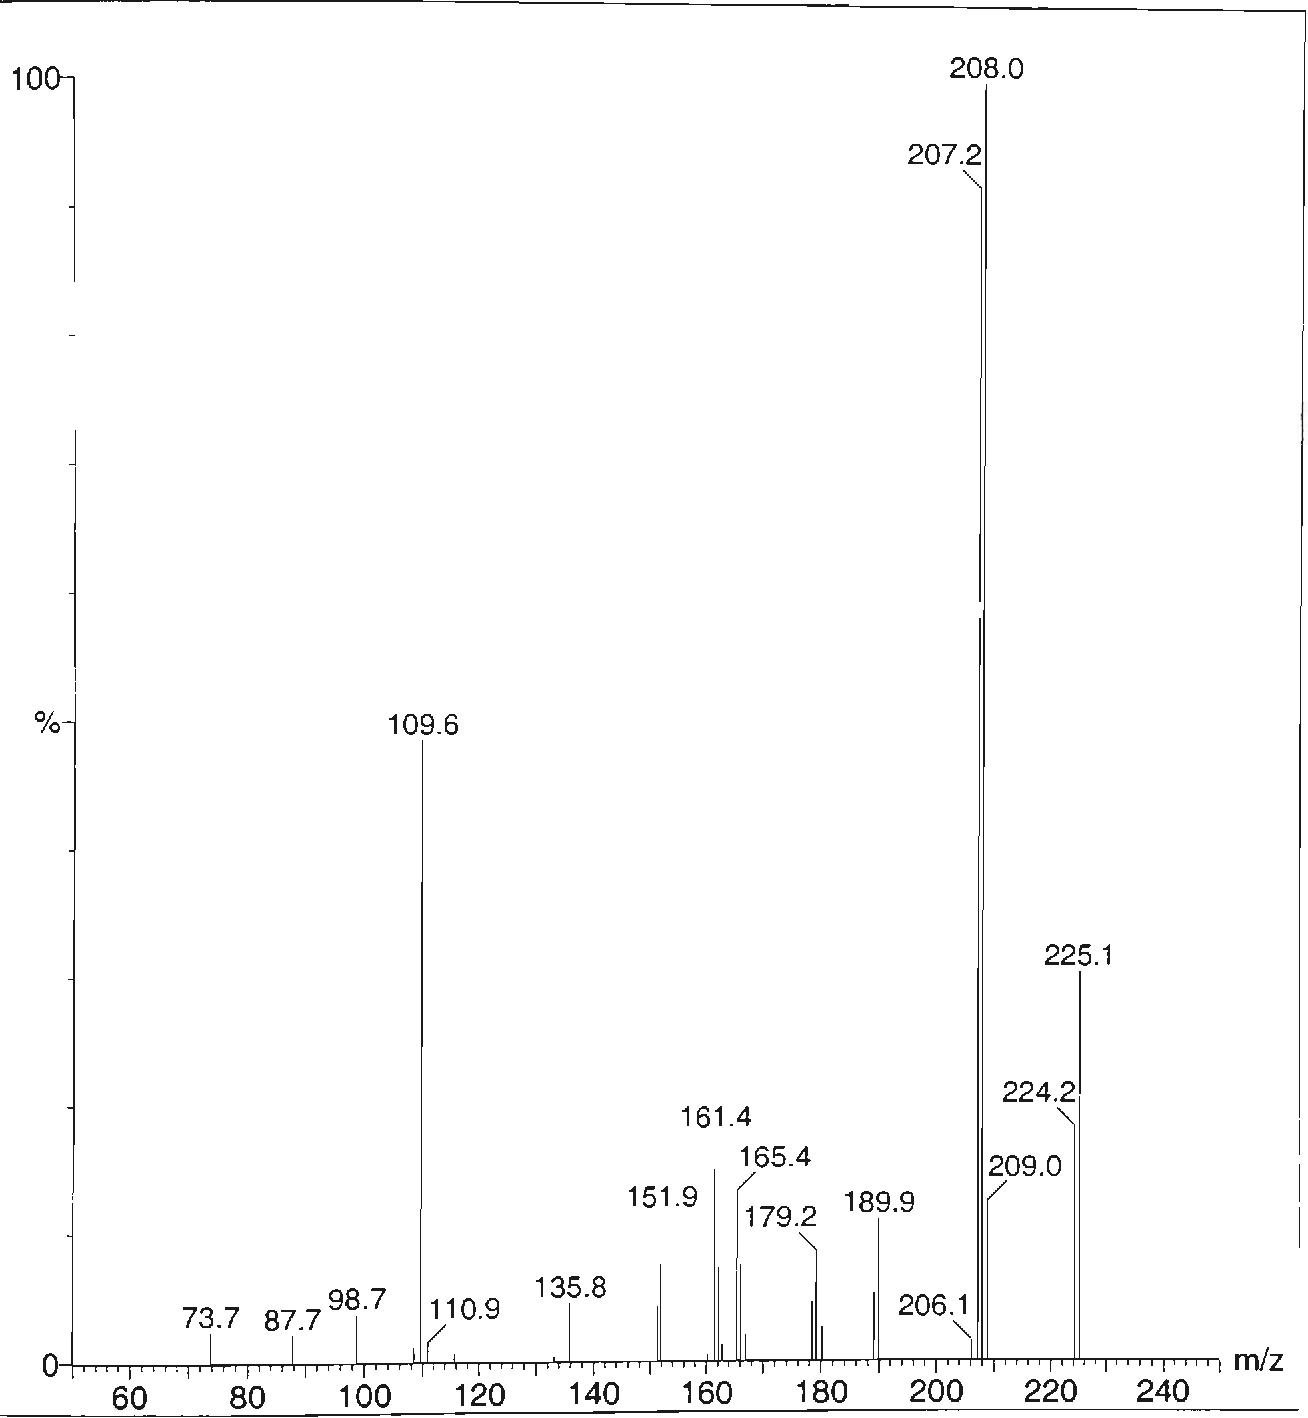 figure 4.15